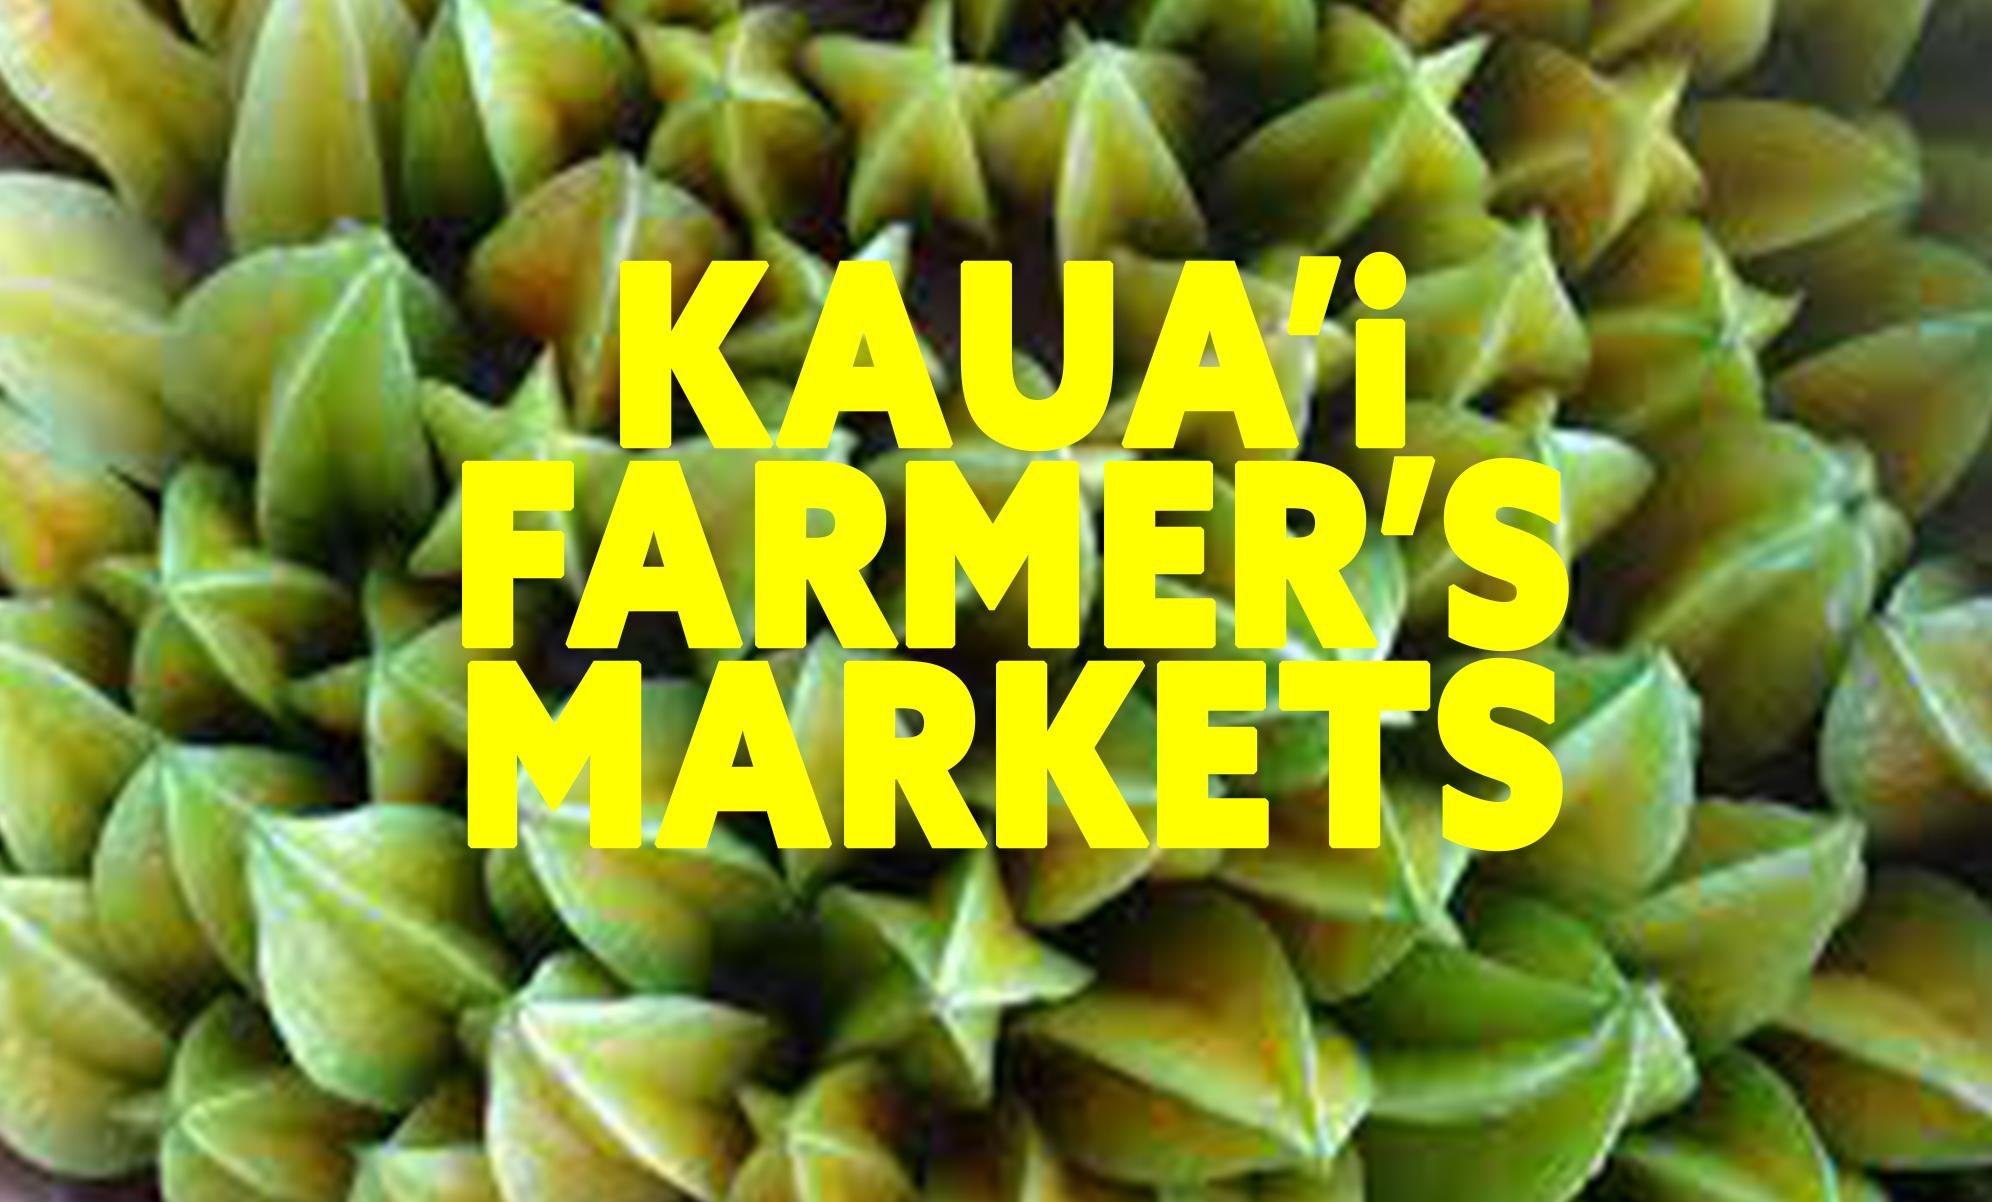 Kauai Farmers Markets